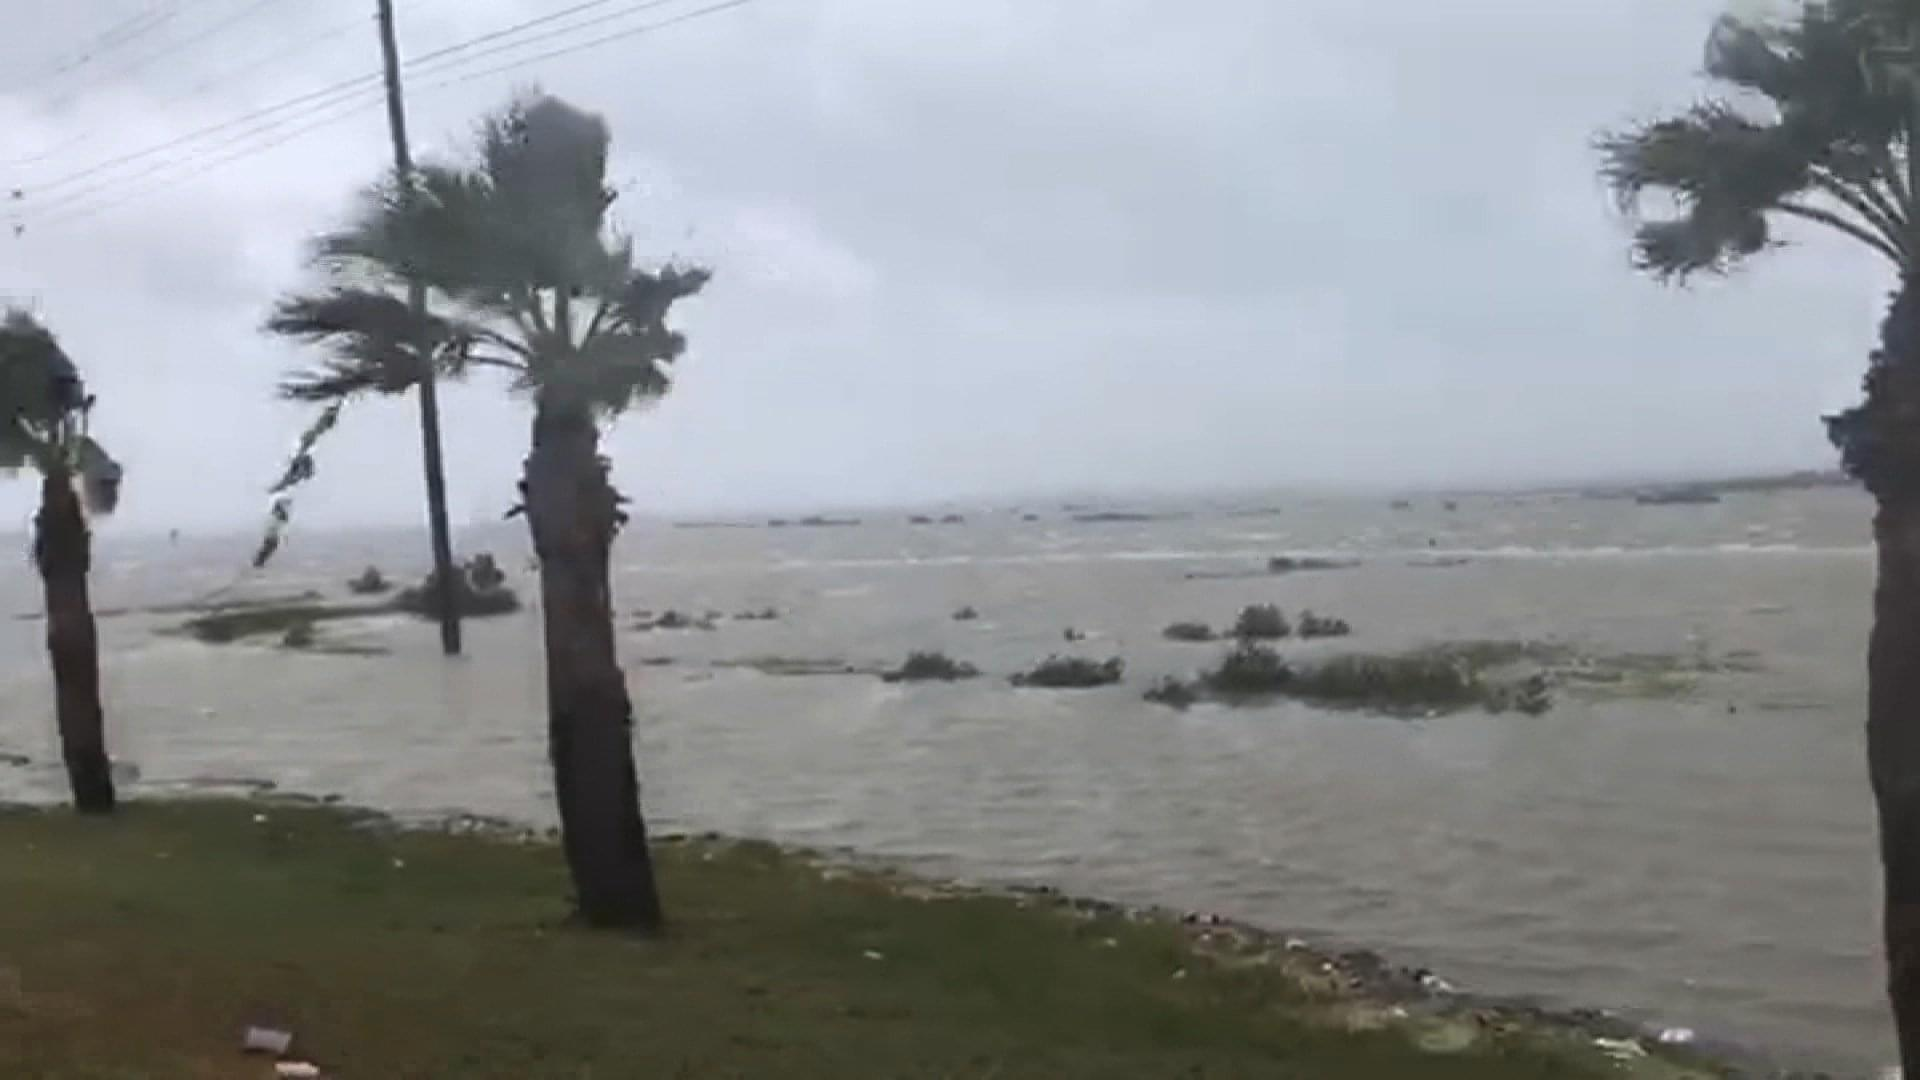 Gulf Coast Bracing For Back-to-Back Hurricanes